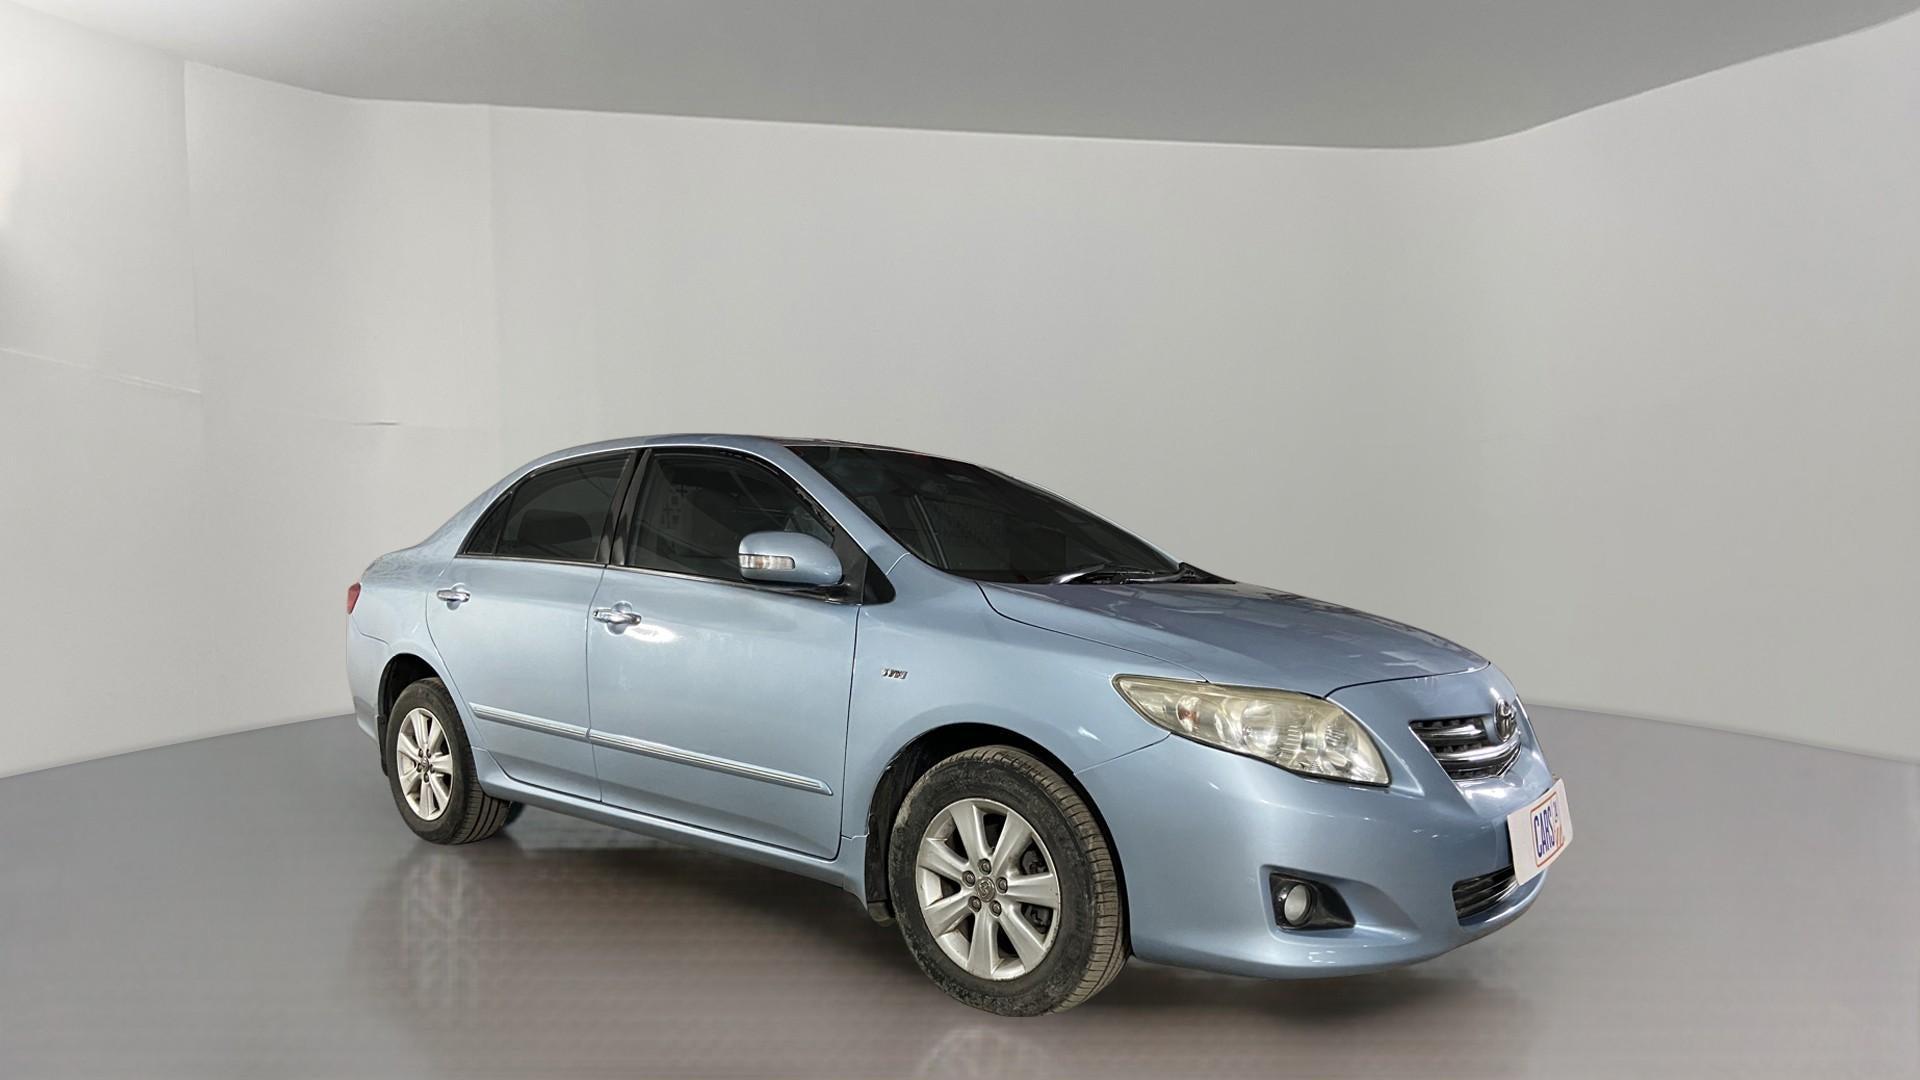 2008 Toyota Corolla Altis 1.8 G